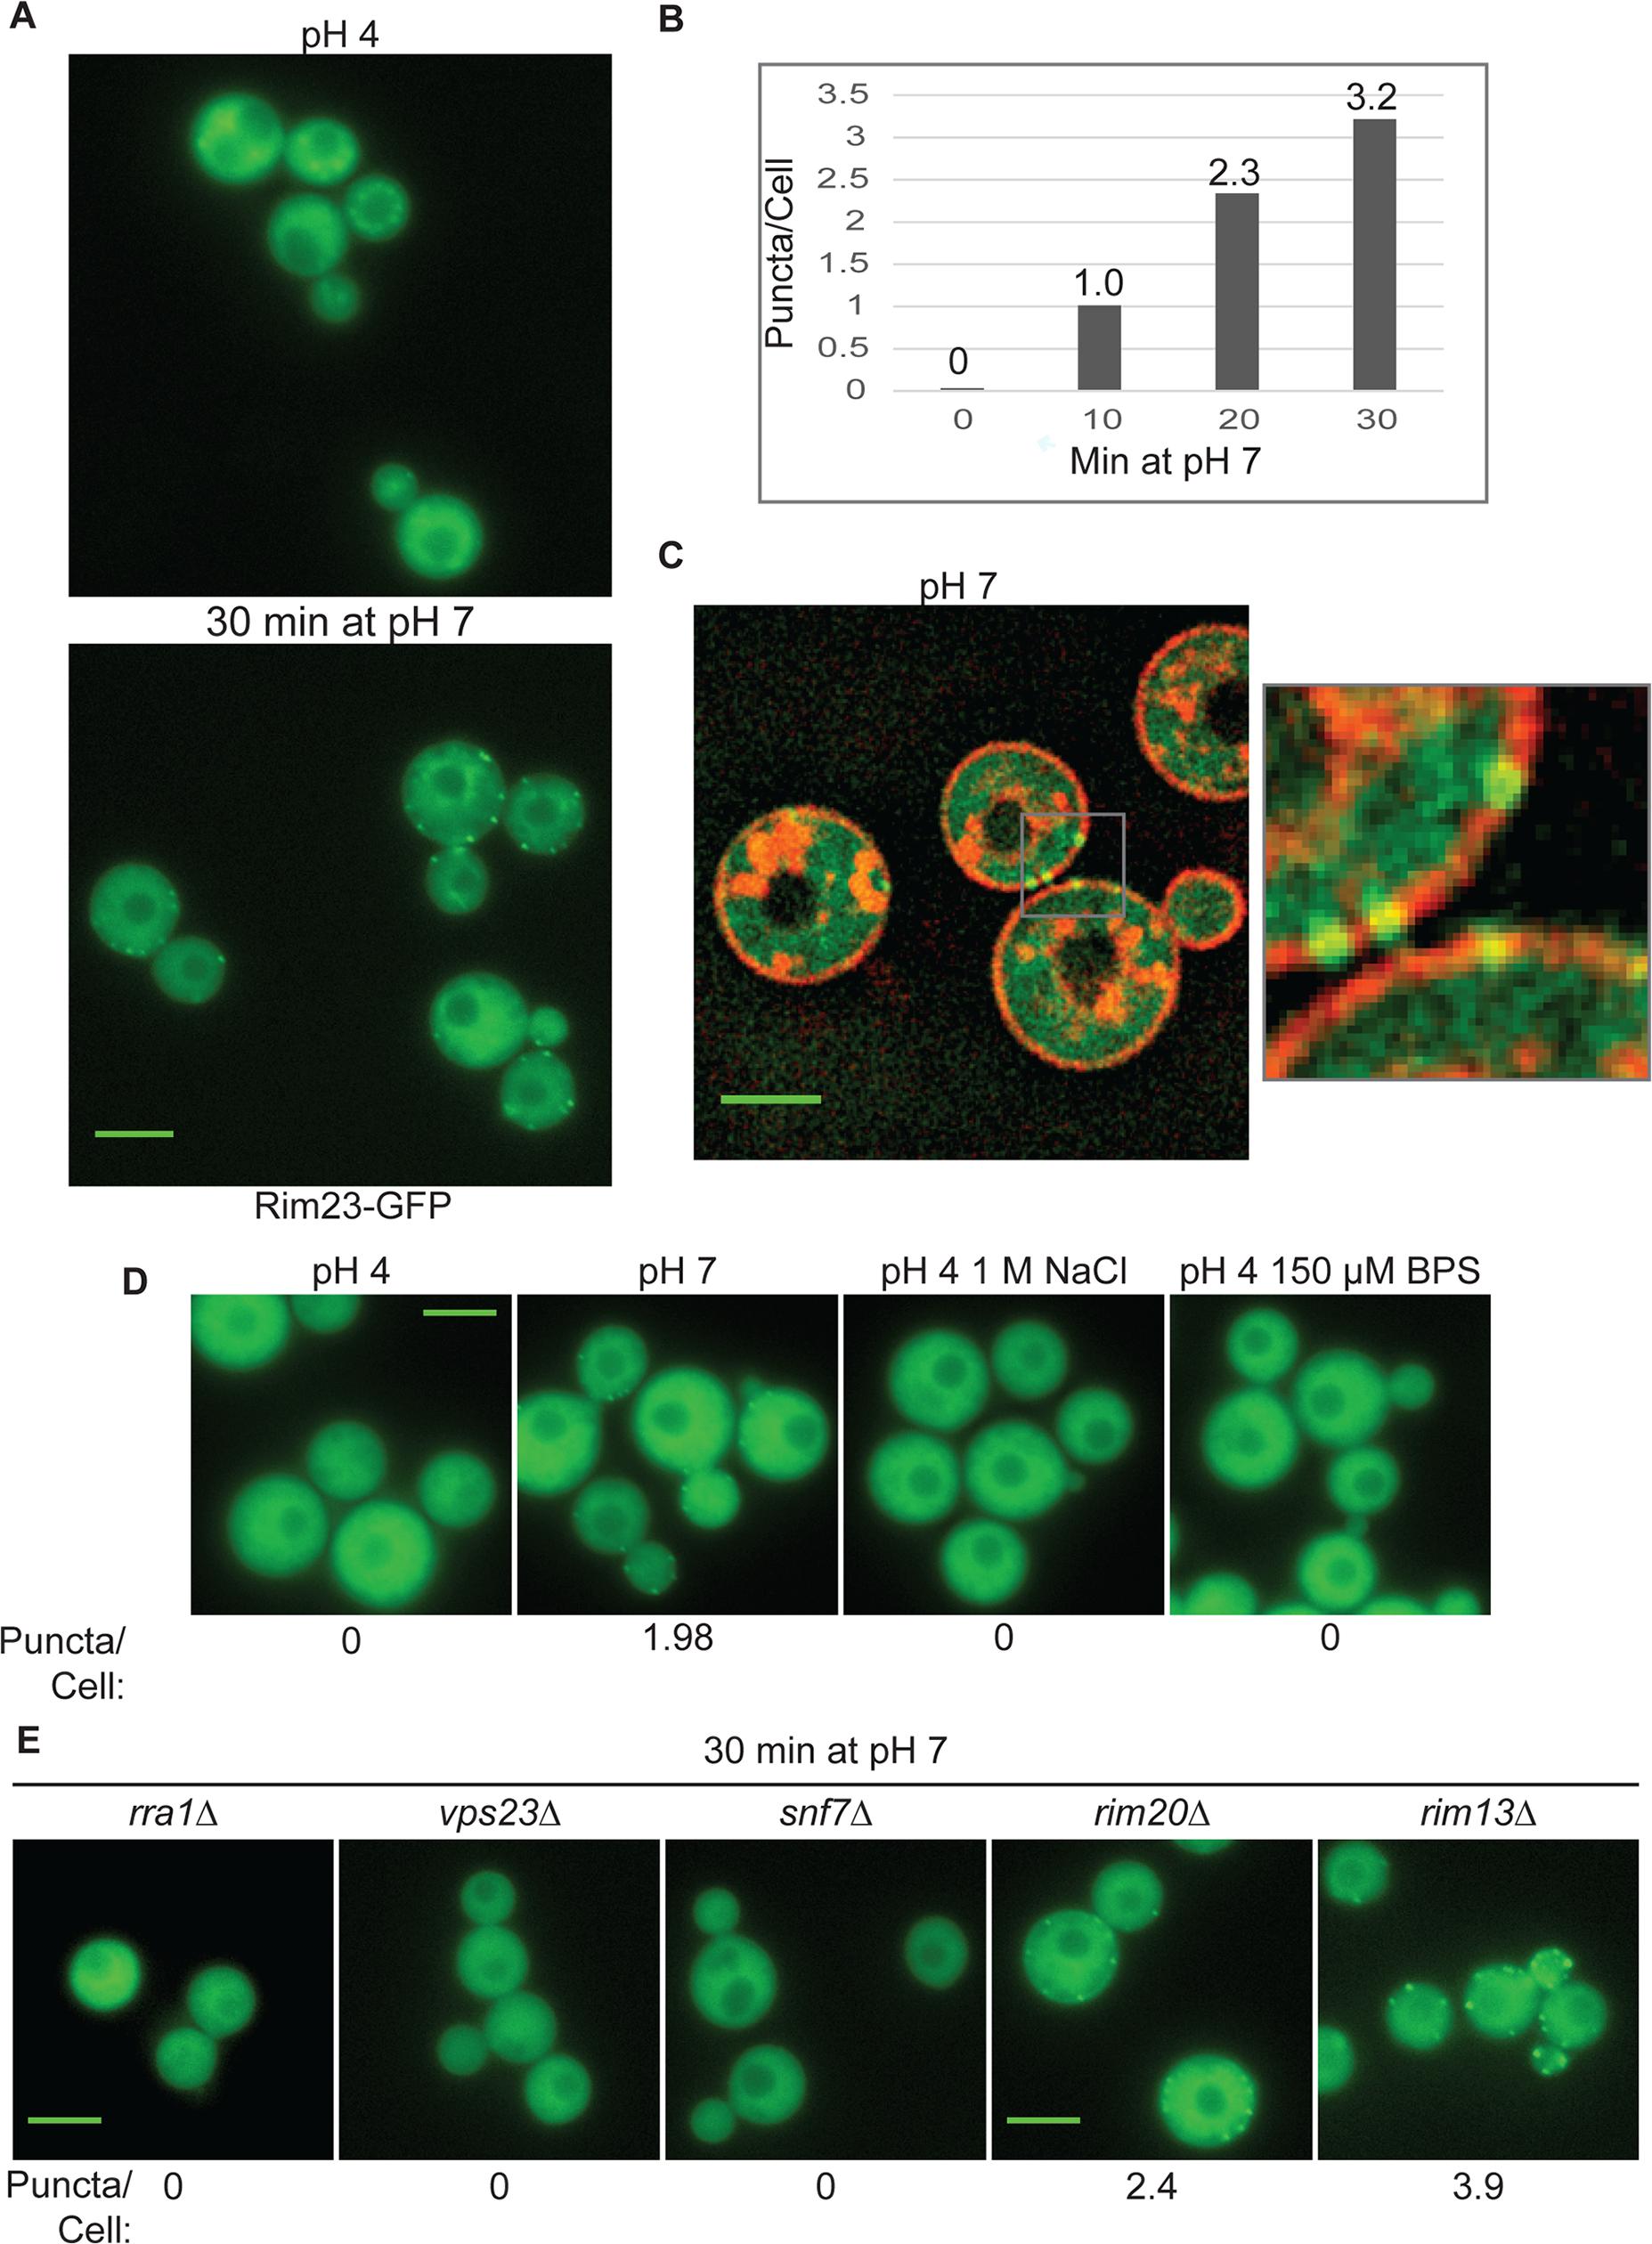 Rim23-GFP forms plasma membrane-associated puncta under neutral/alkaline pH conditions.